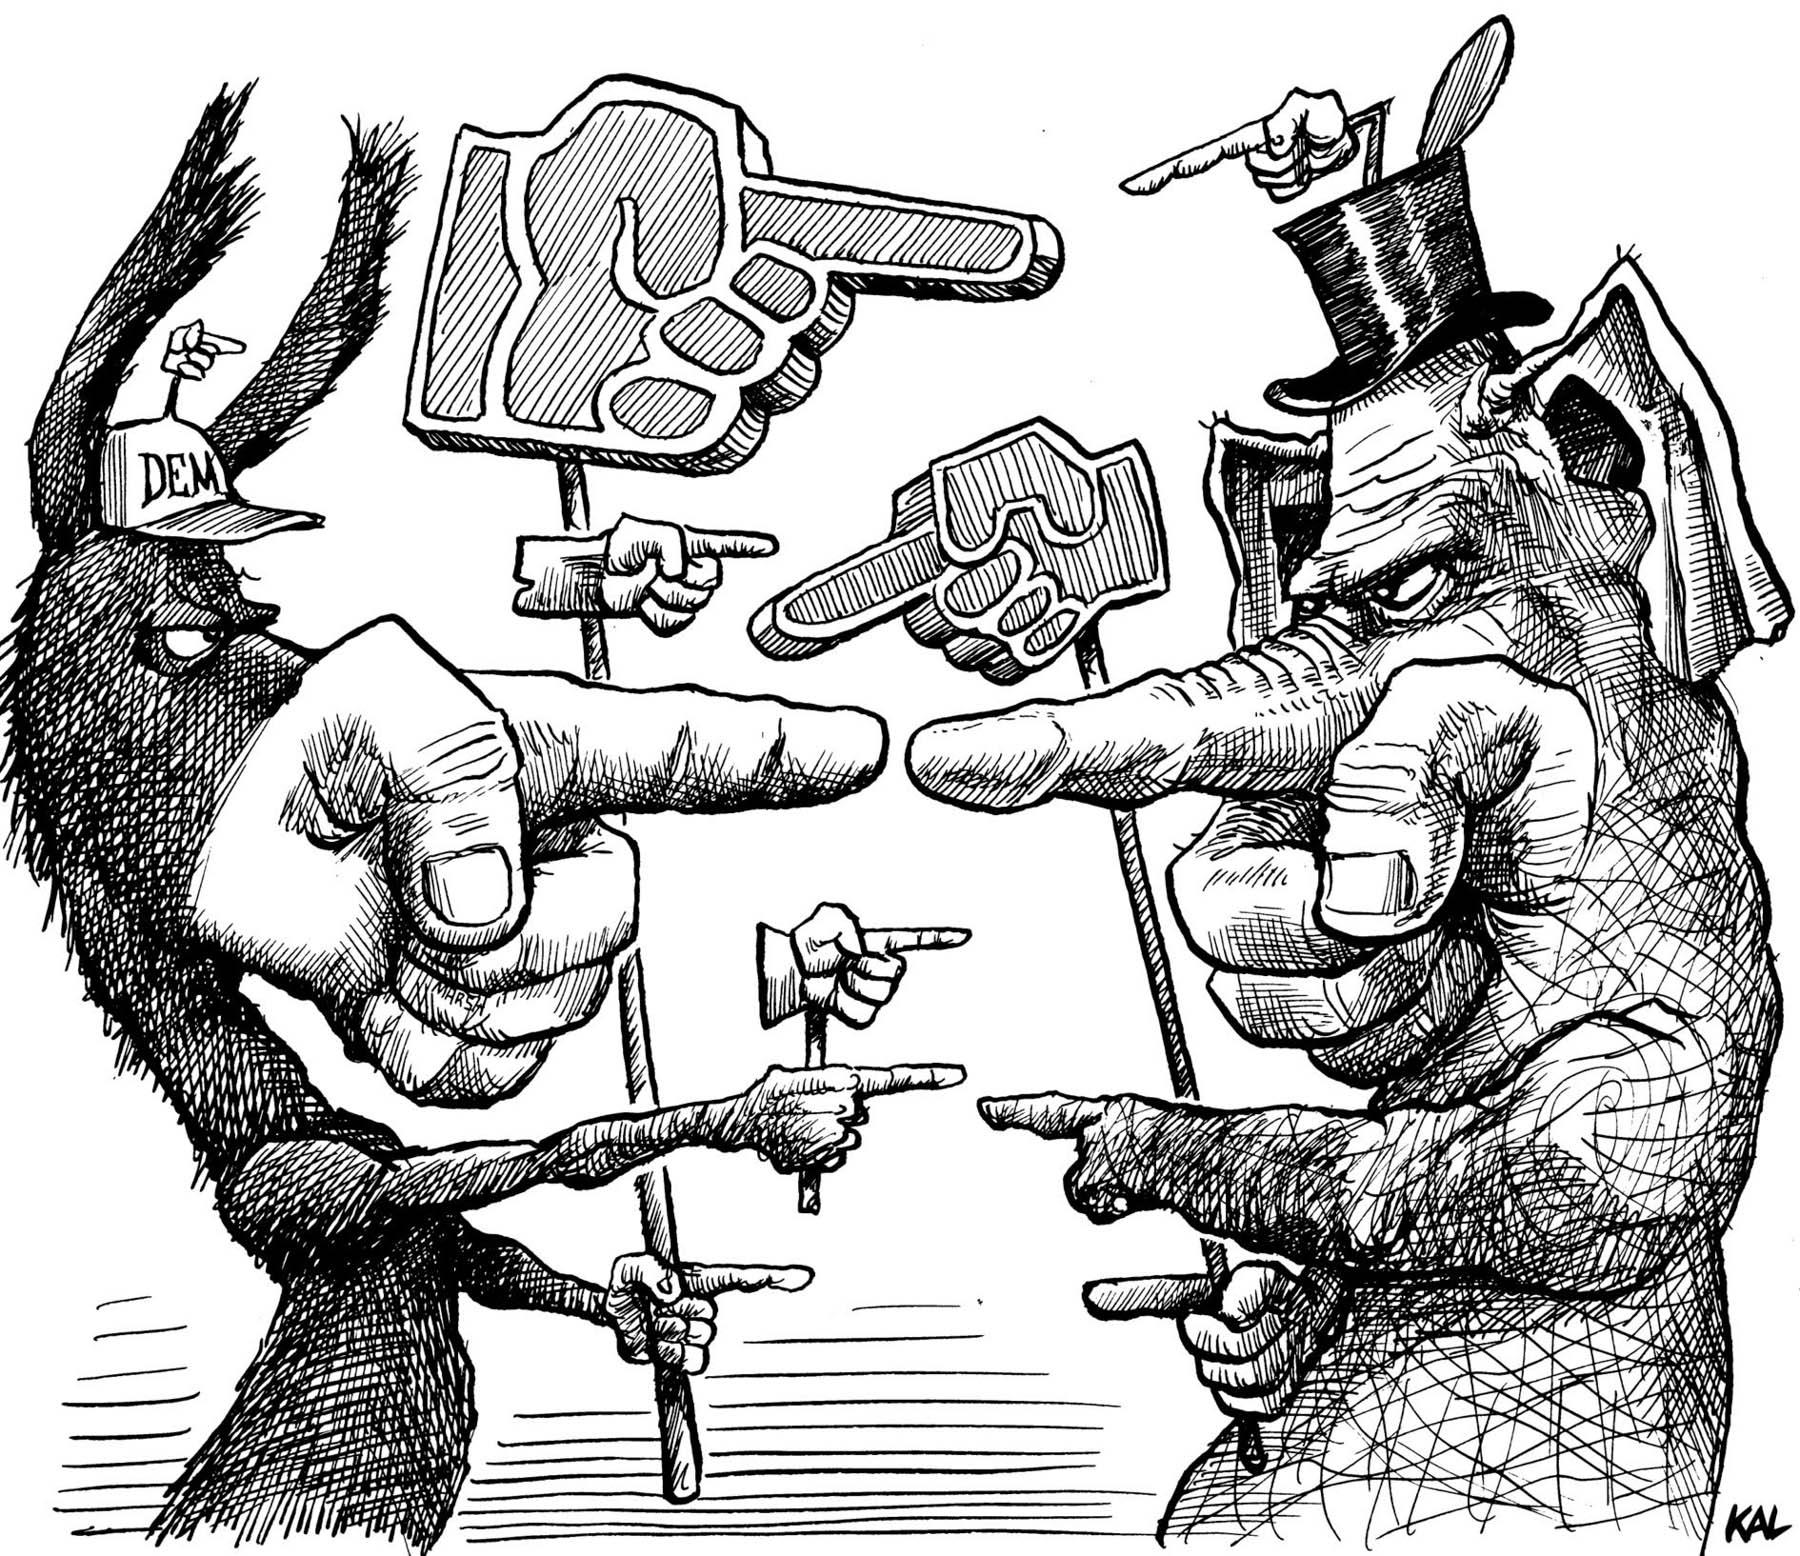 cartoonist kal makes people laugh and ponder shareamerica